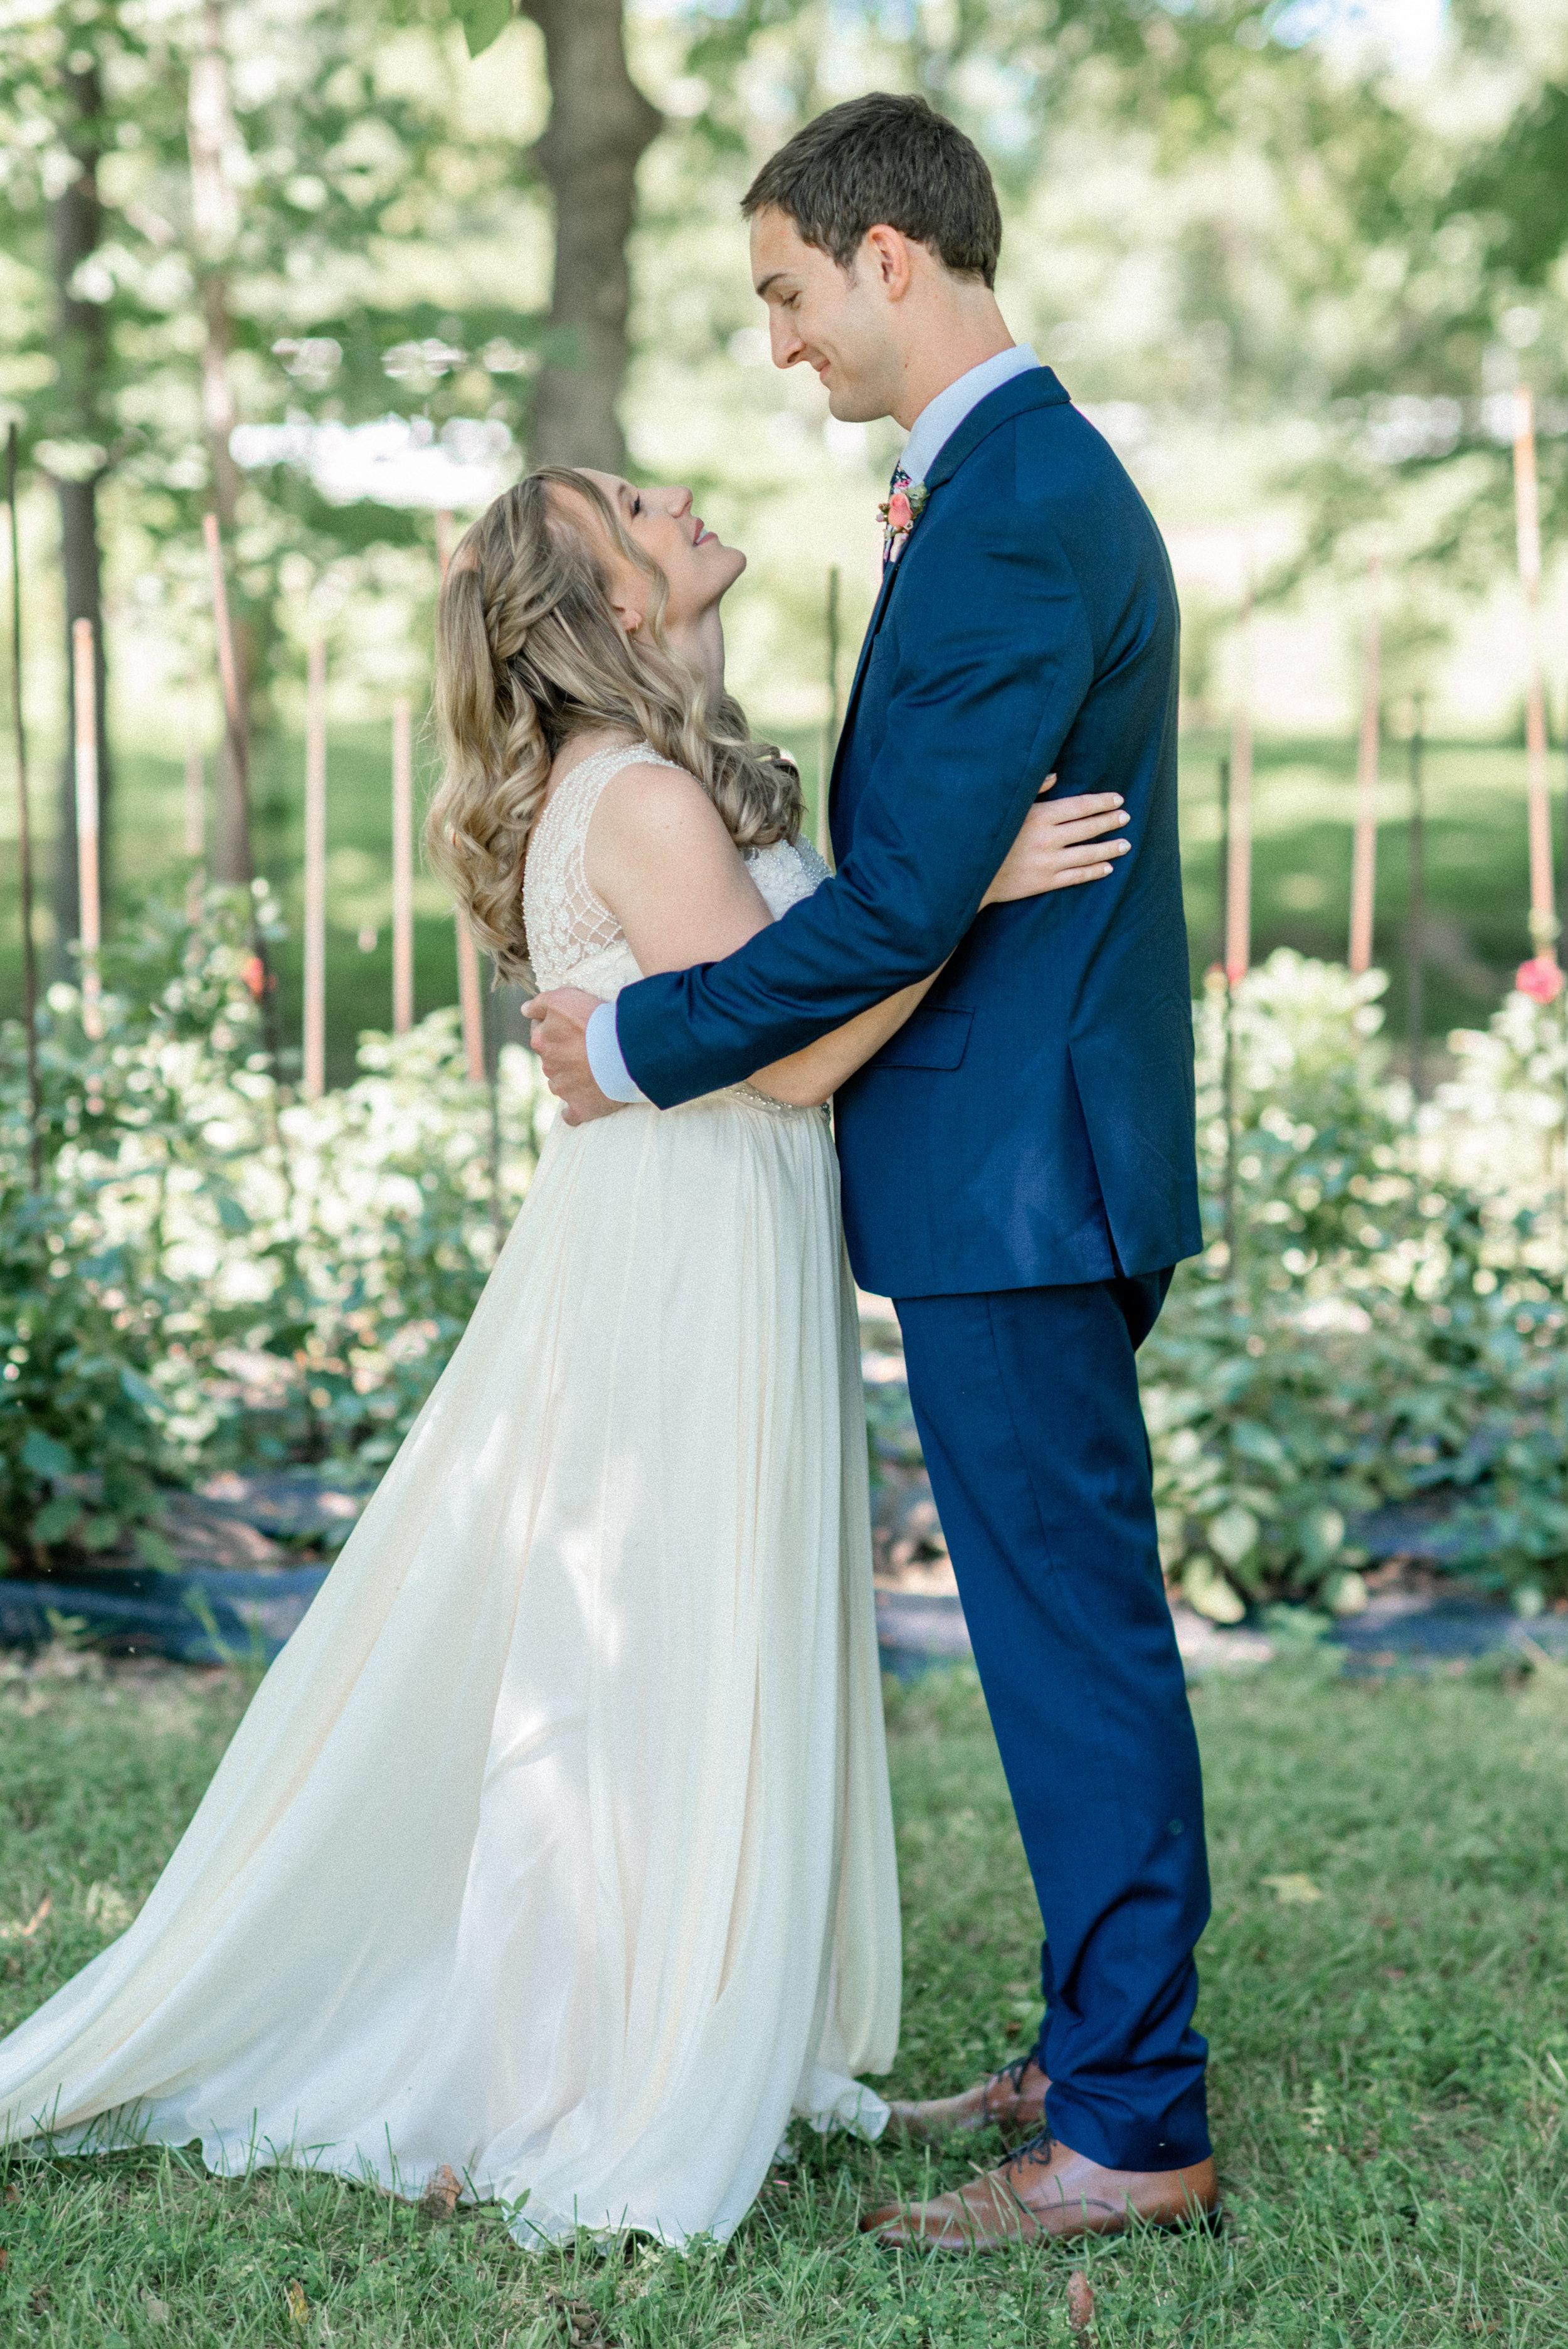 Brideandgroom-Anna+Dan_(7_of_71).jpg